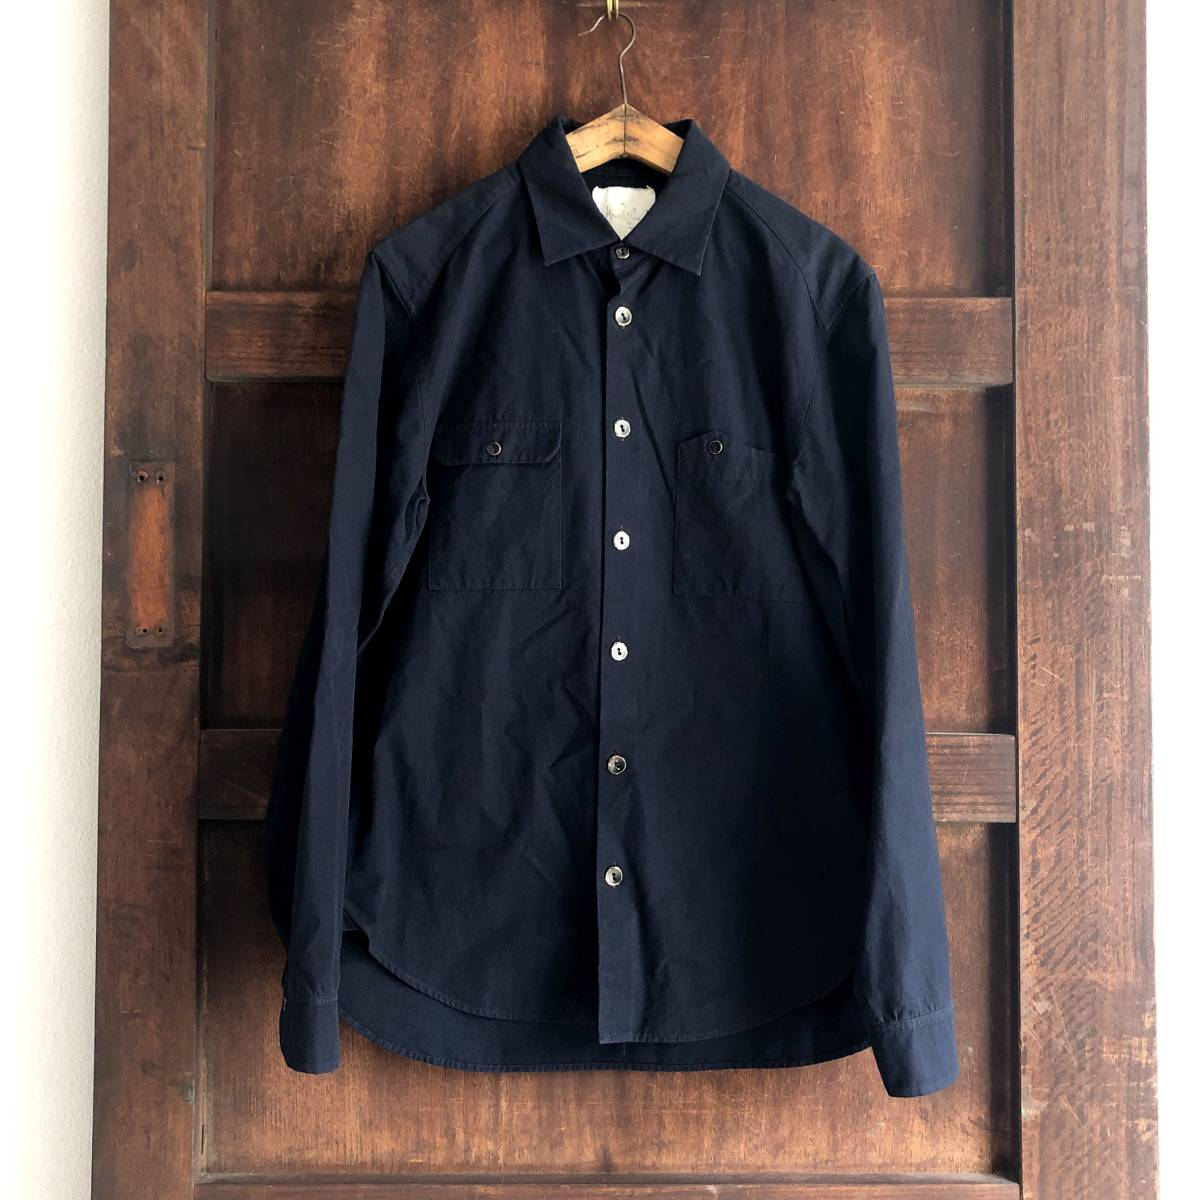 Araki Yuu 17AW Double pocket shirt jacket Nero_navy/Black button SIZE1 アラキユウ/シャツ/ジャケット_画像2